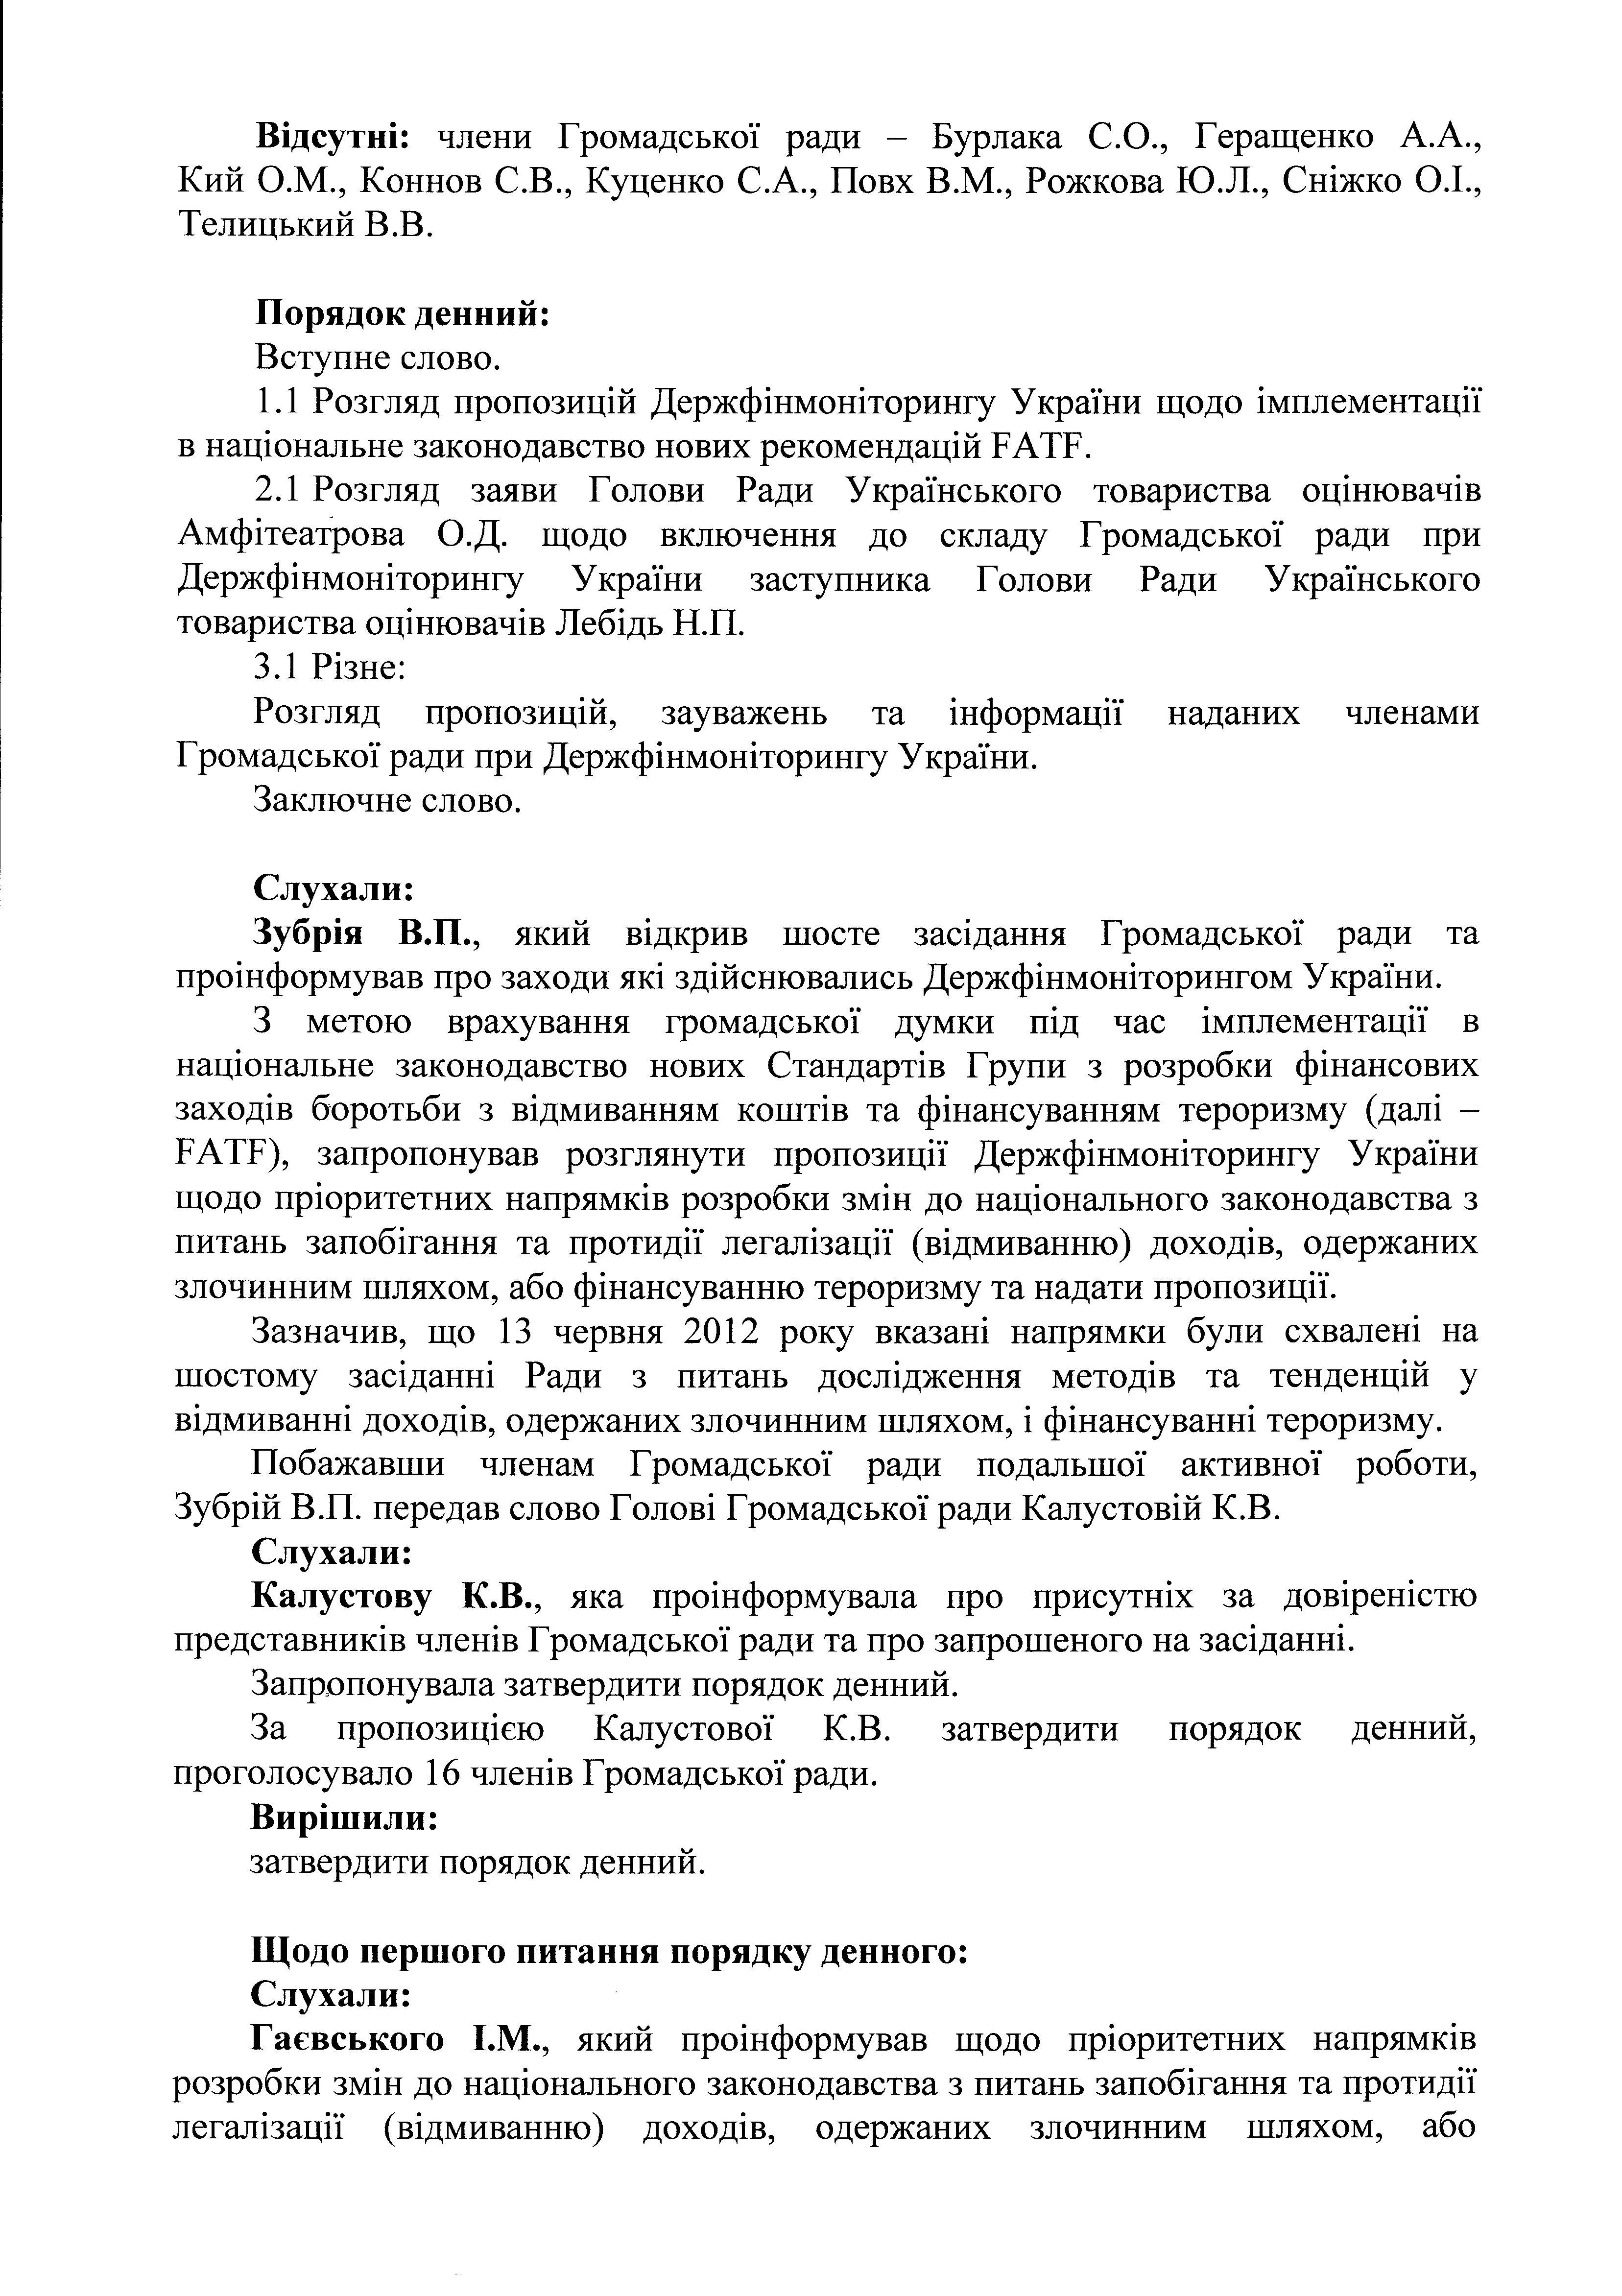 Protokol_2.jpg